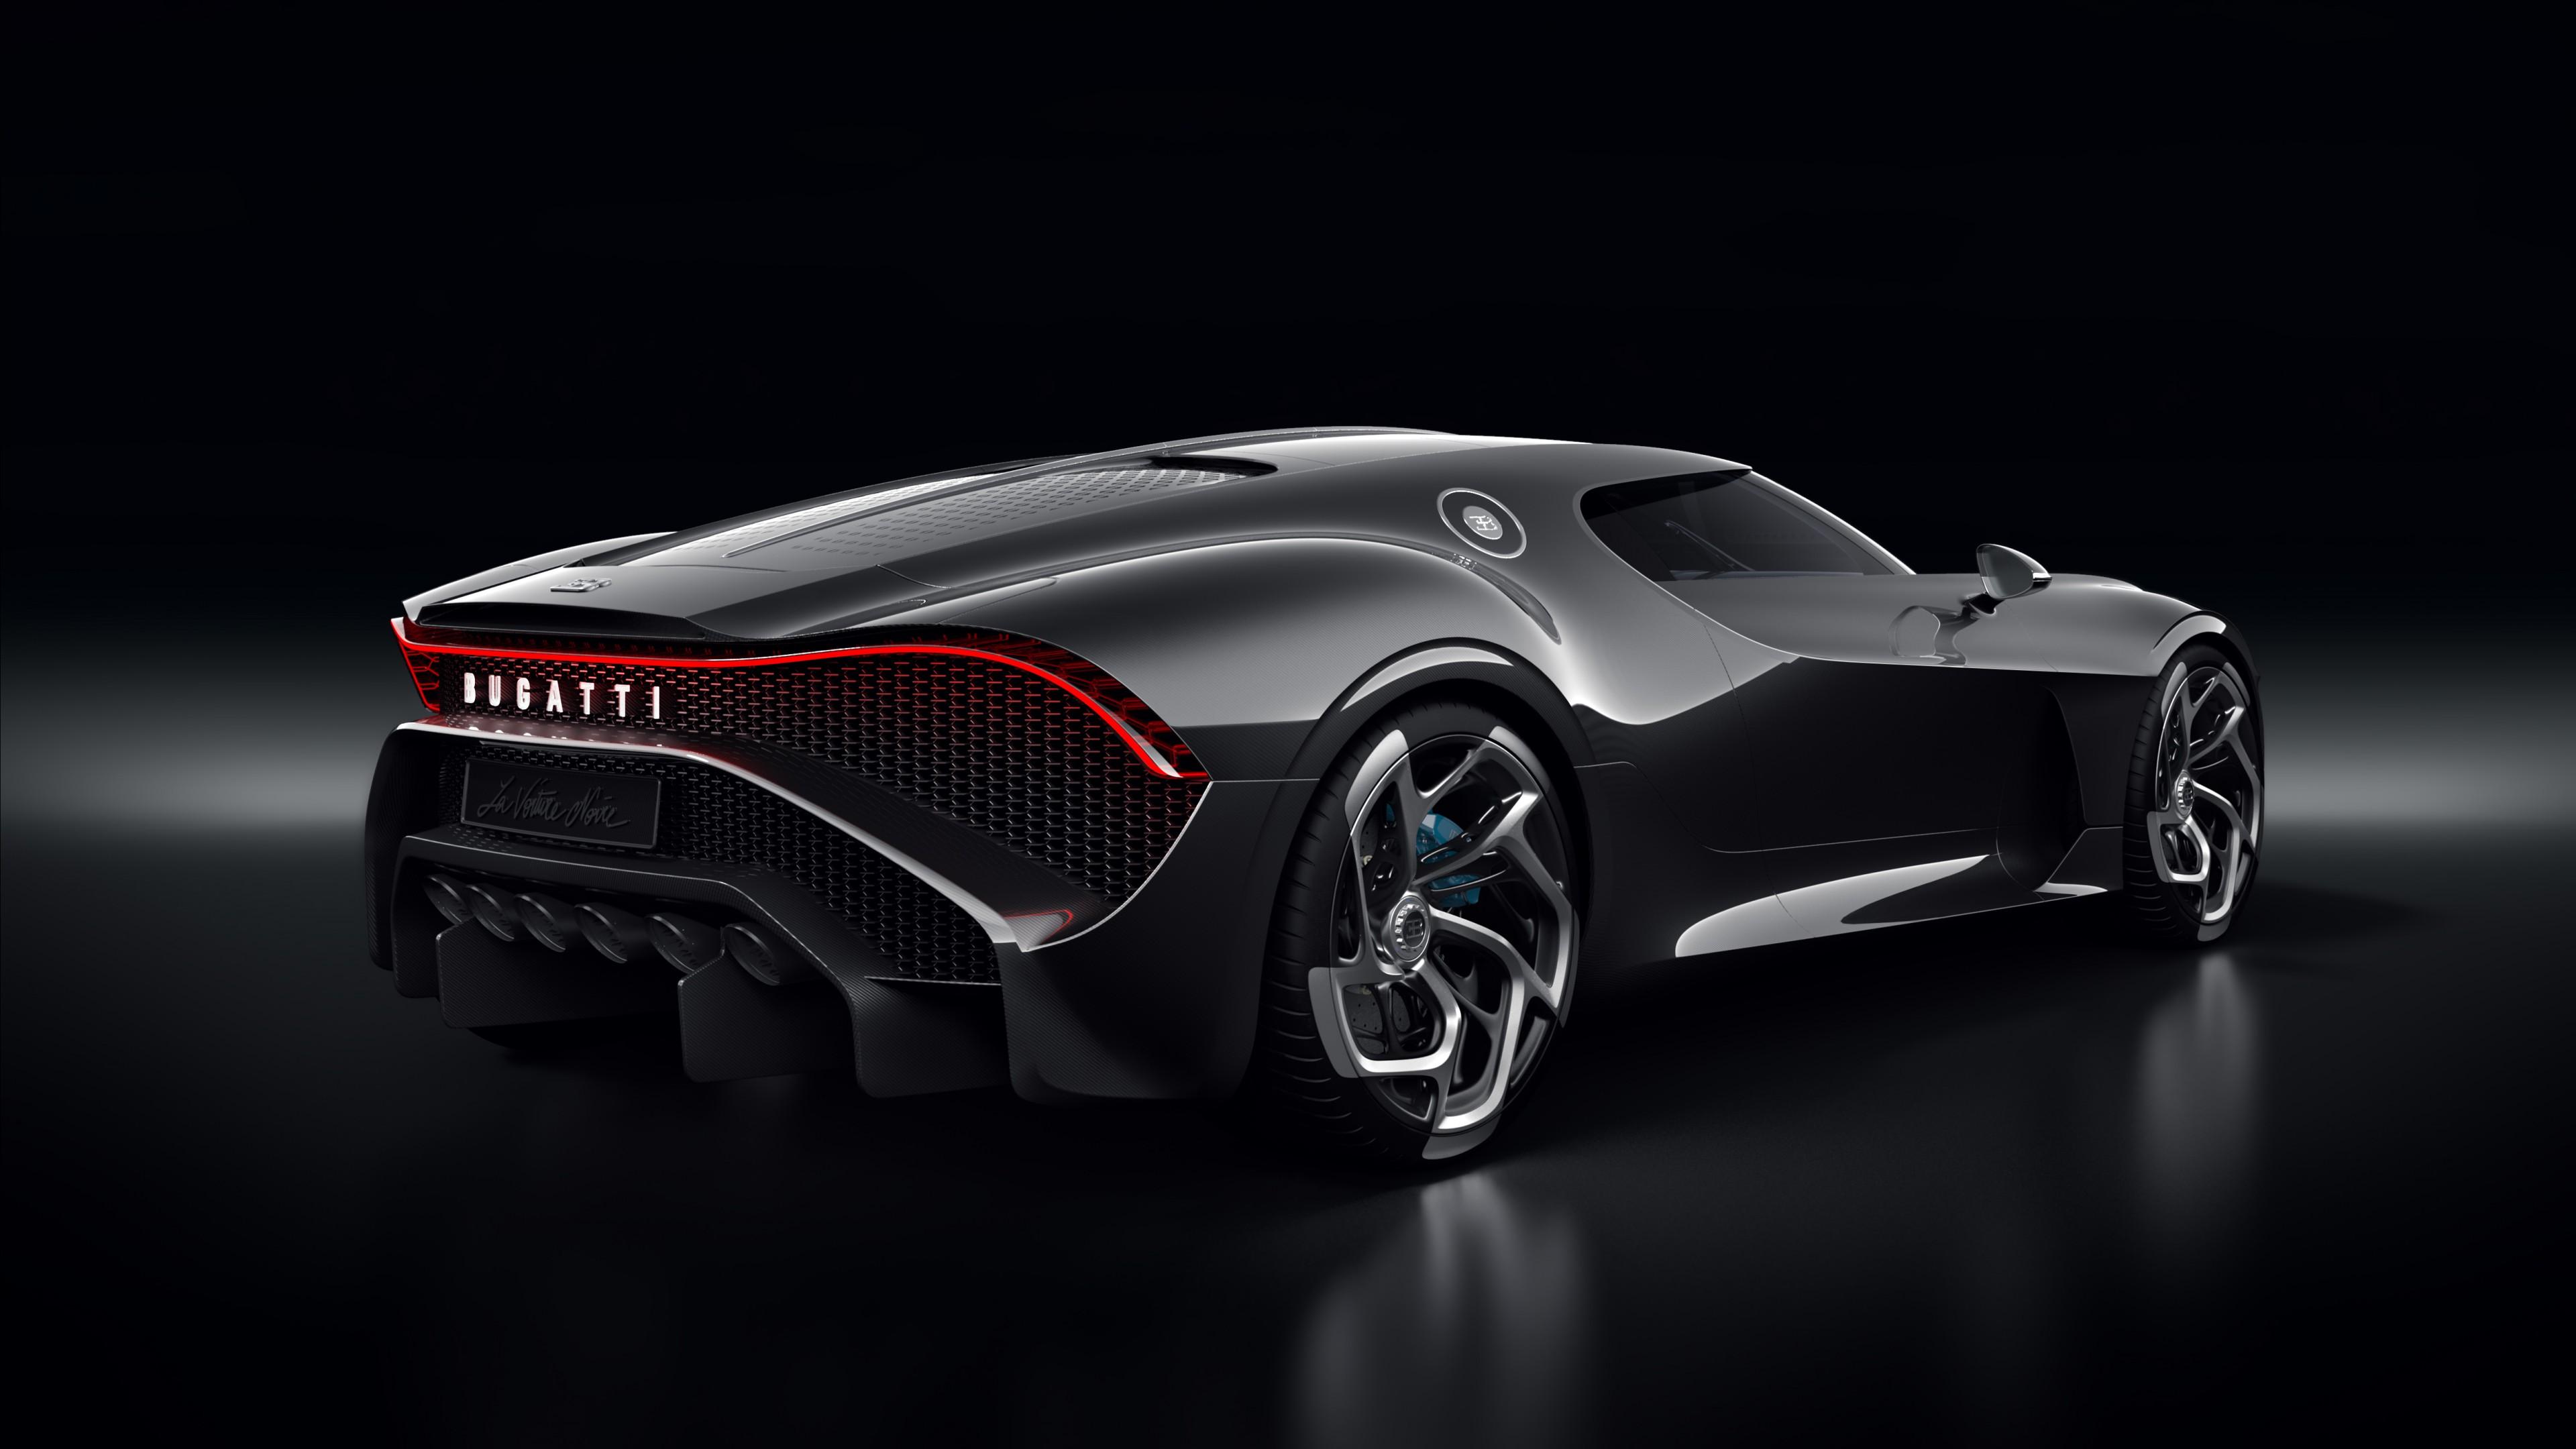 Wallpaper Bugatti La Voiture Noire, Geneva Motor Show 2019 ...